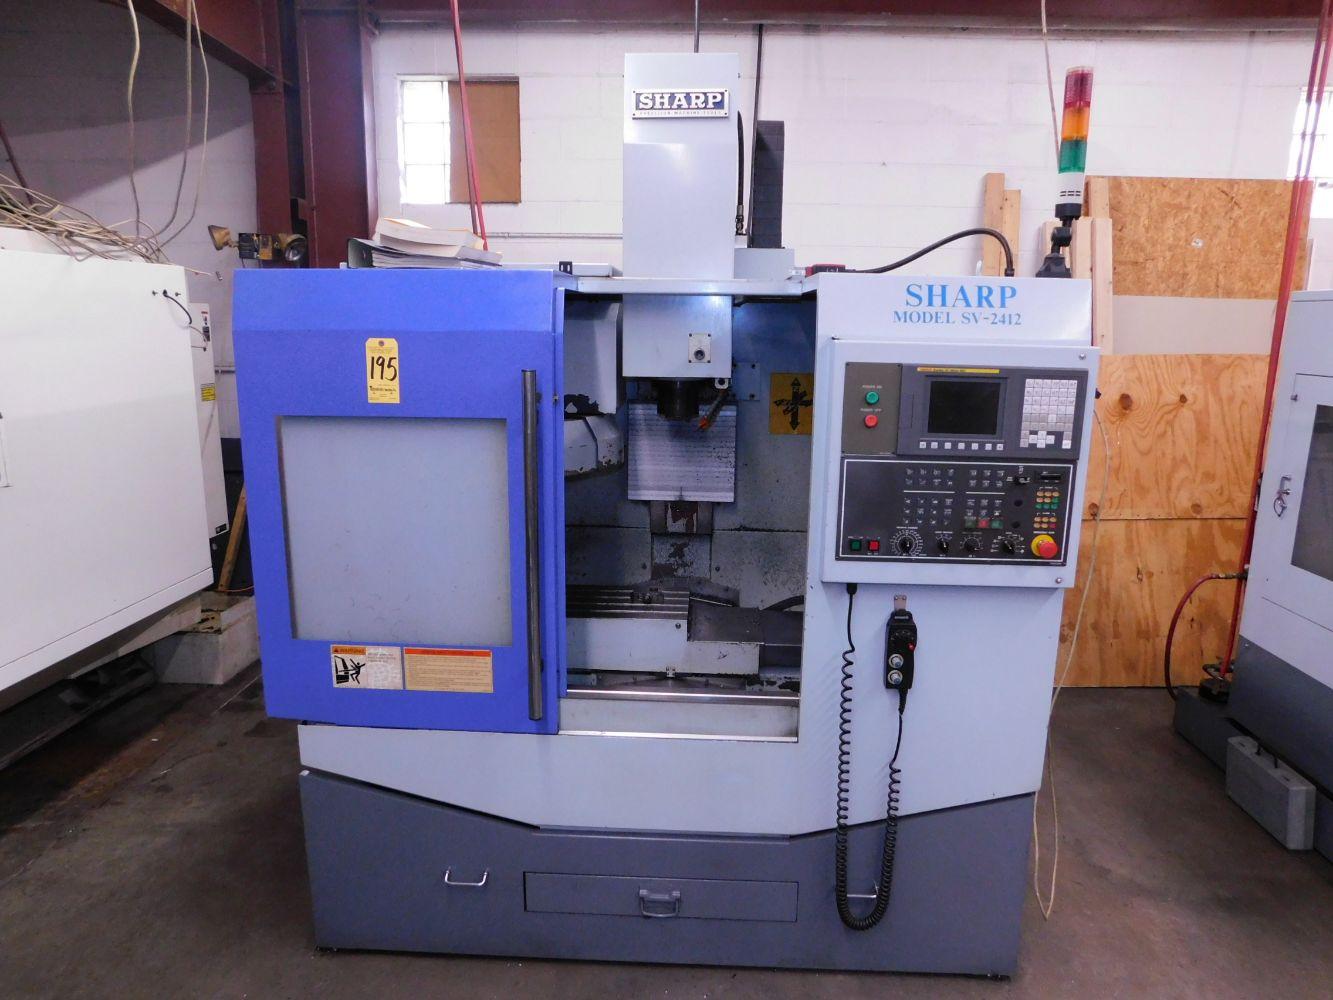 CENTERLINE TOOL & MACHINE, LLC - Well-Maintained Dayton, OH Tool & Die Shop